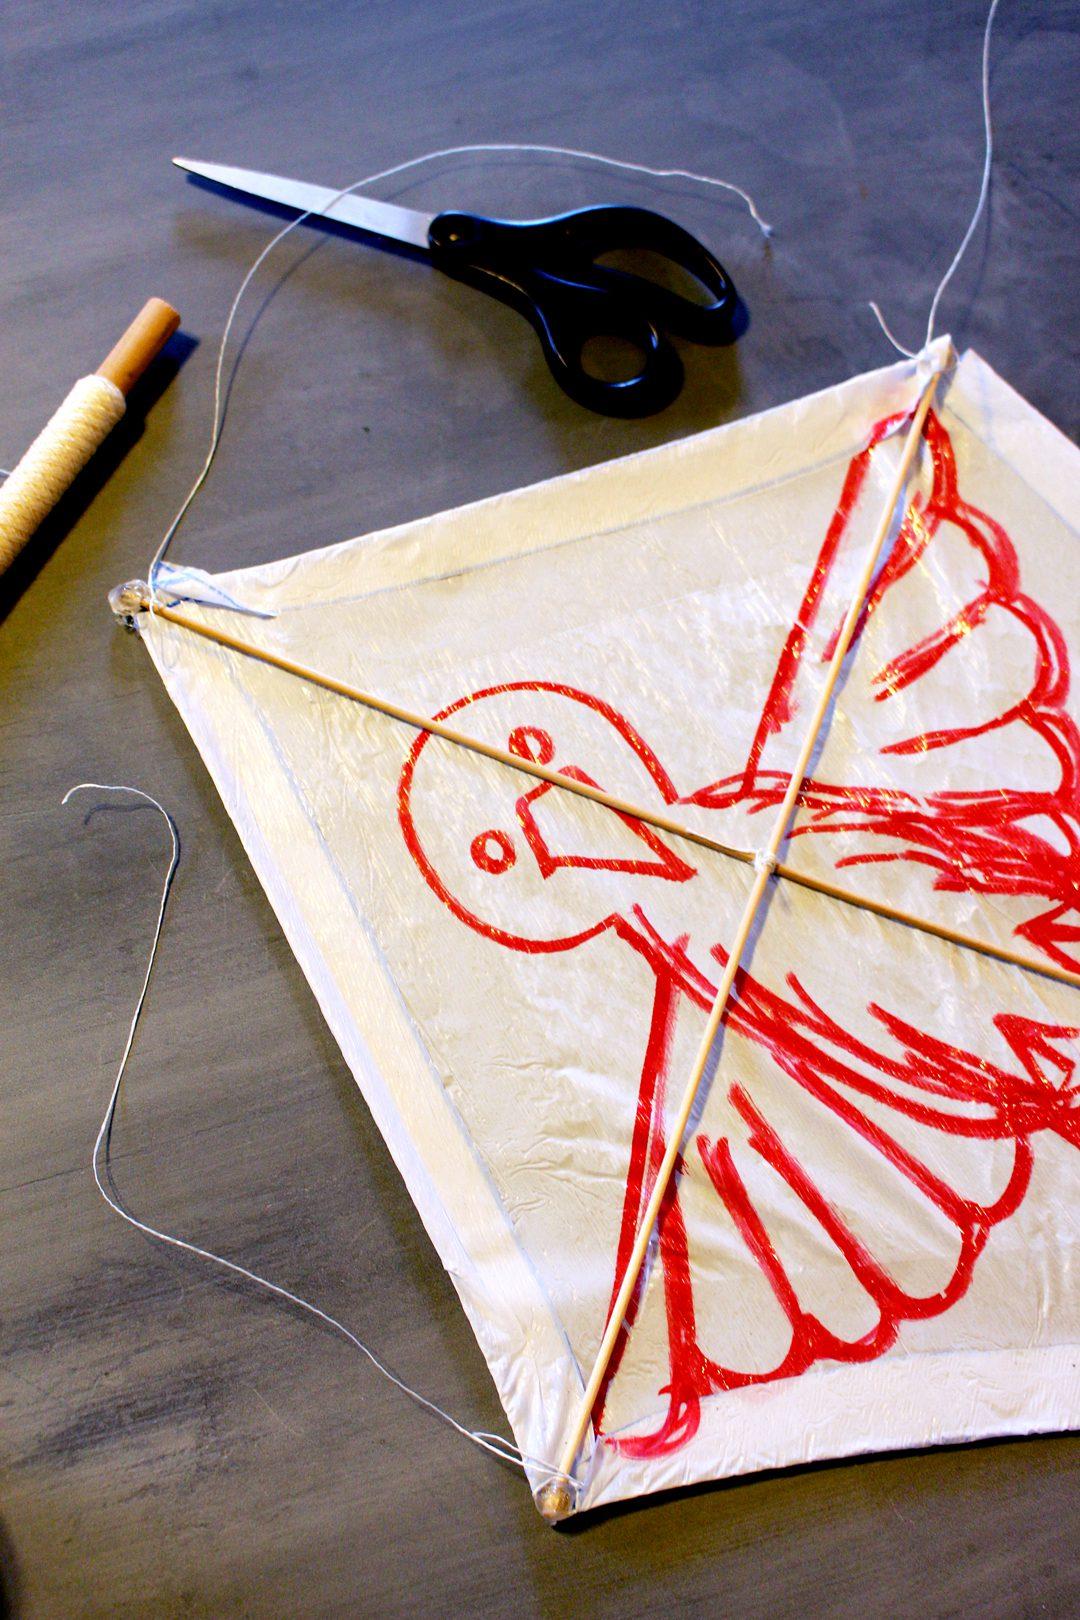 Make Your Own Diamond Shaped Kite